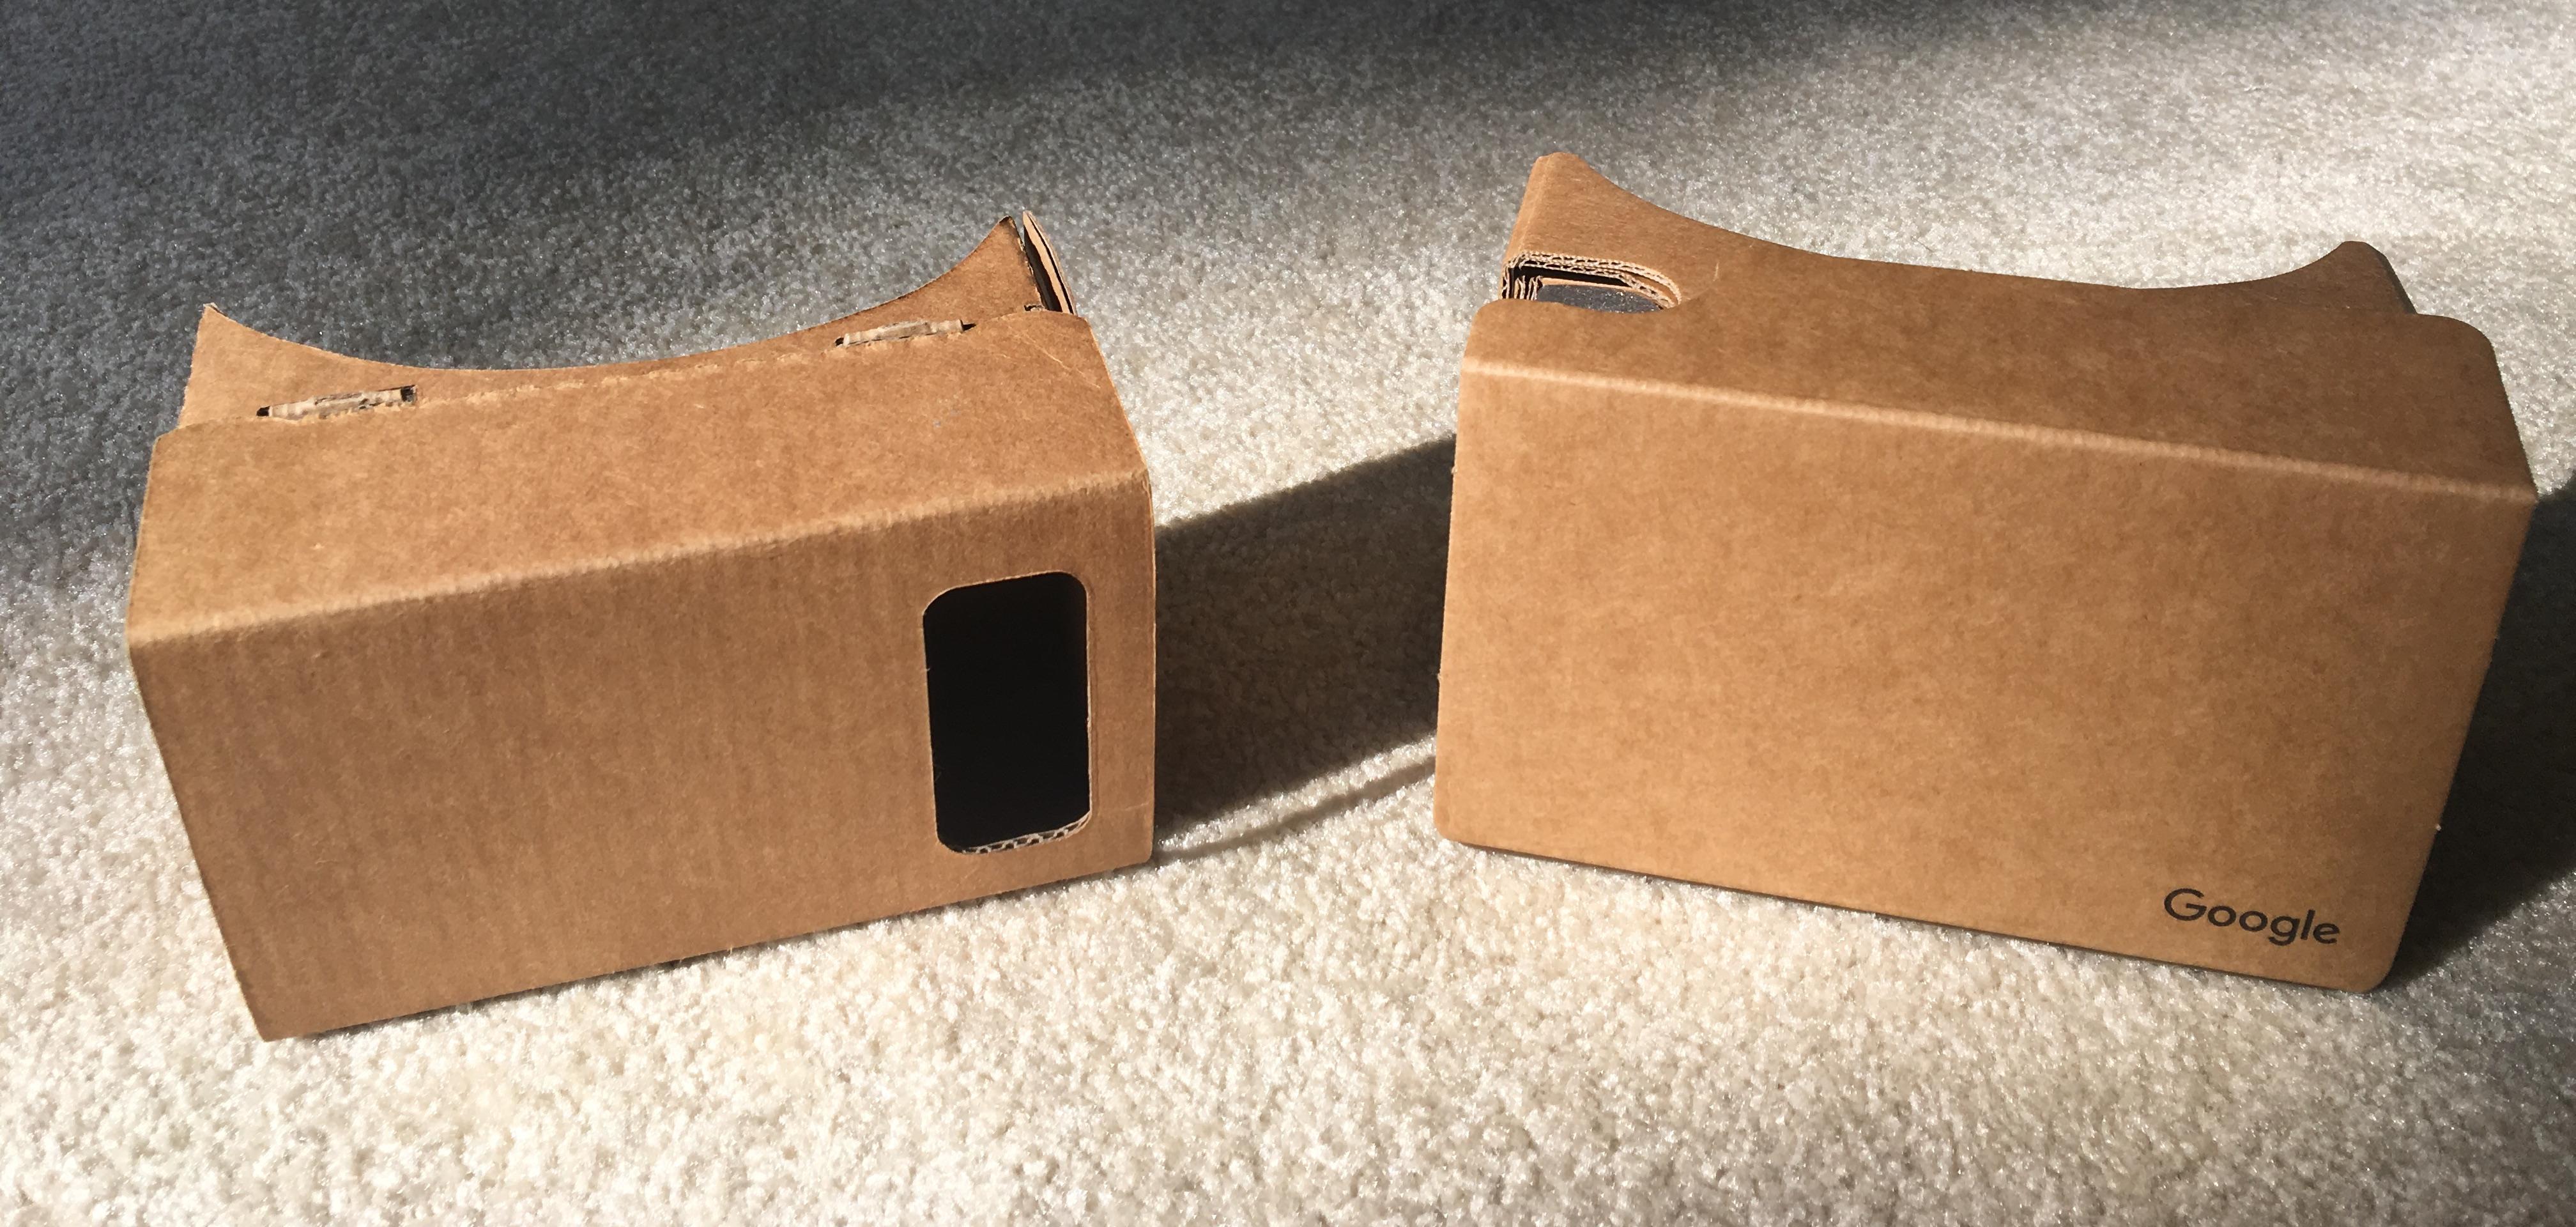 Google Cardboard as